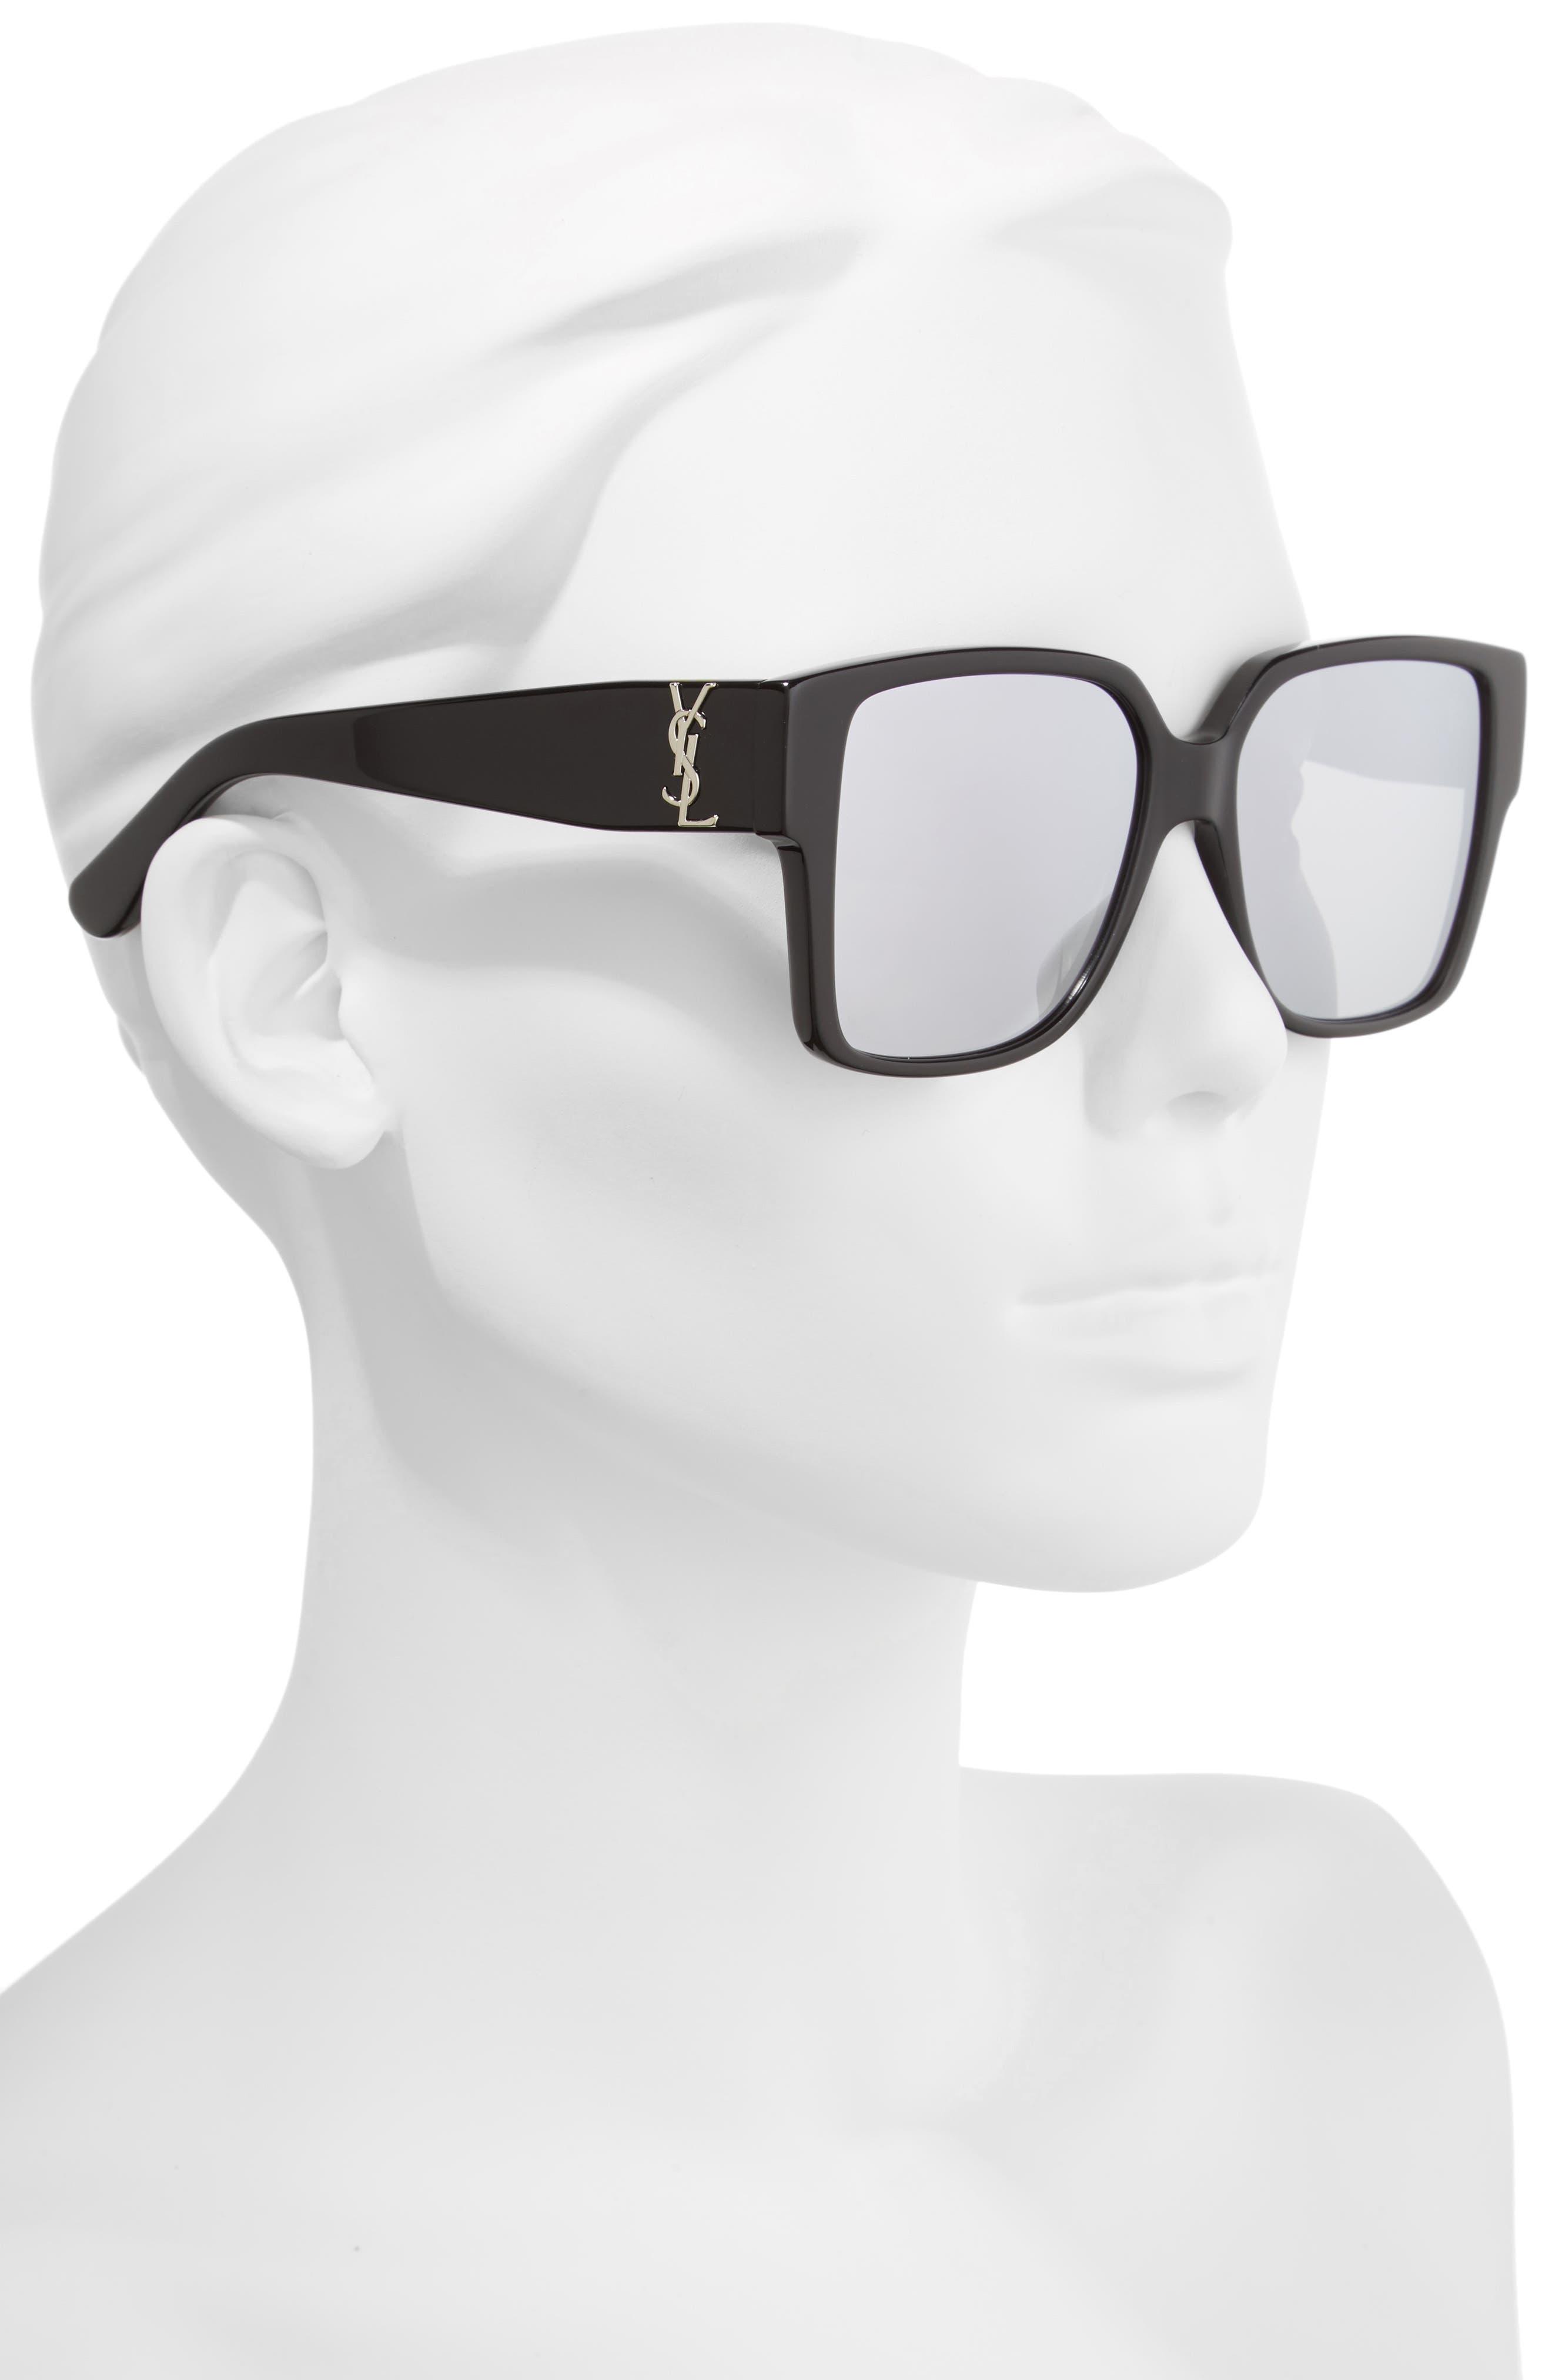 55mm Square Sunglasses,                             Alternate thumbnail 2, color,                             001